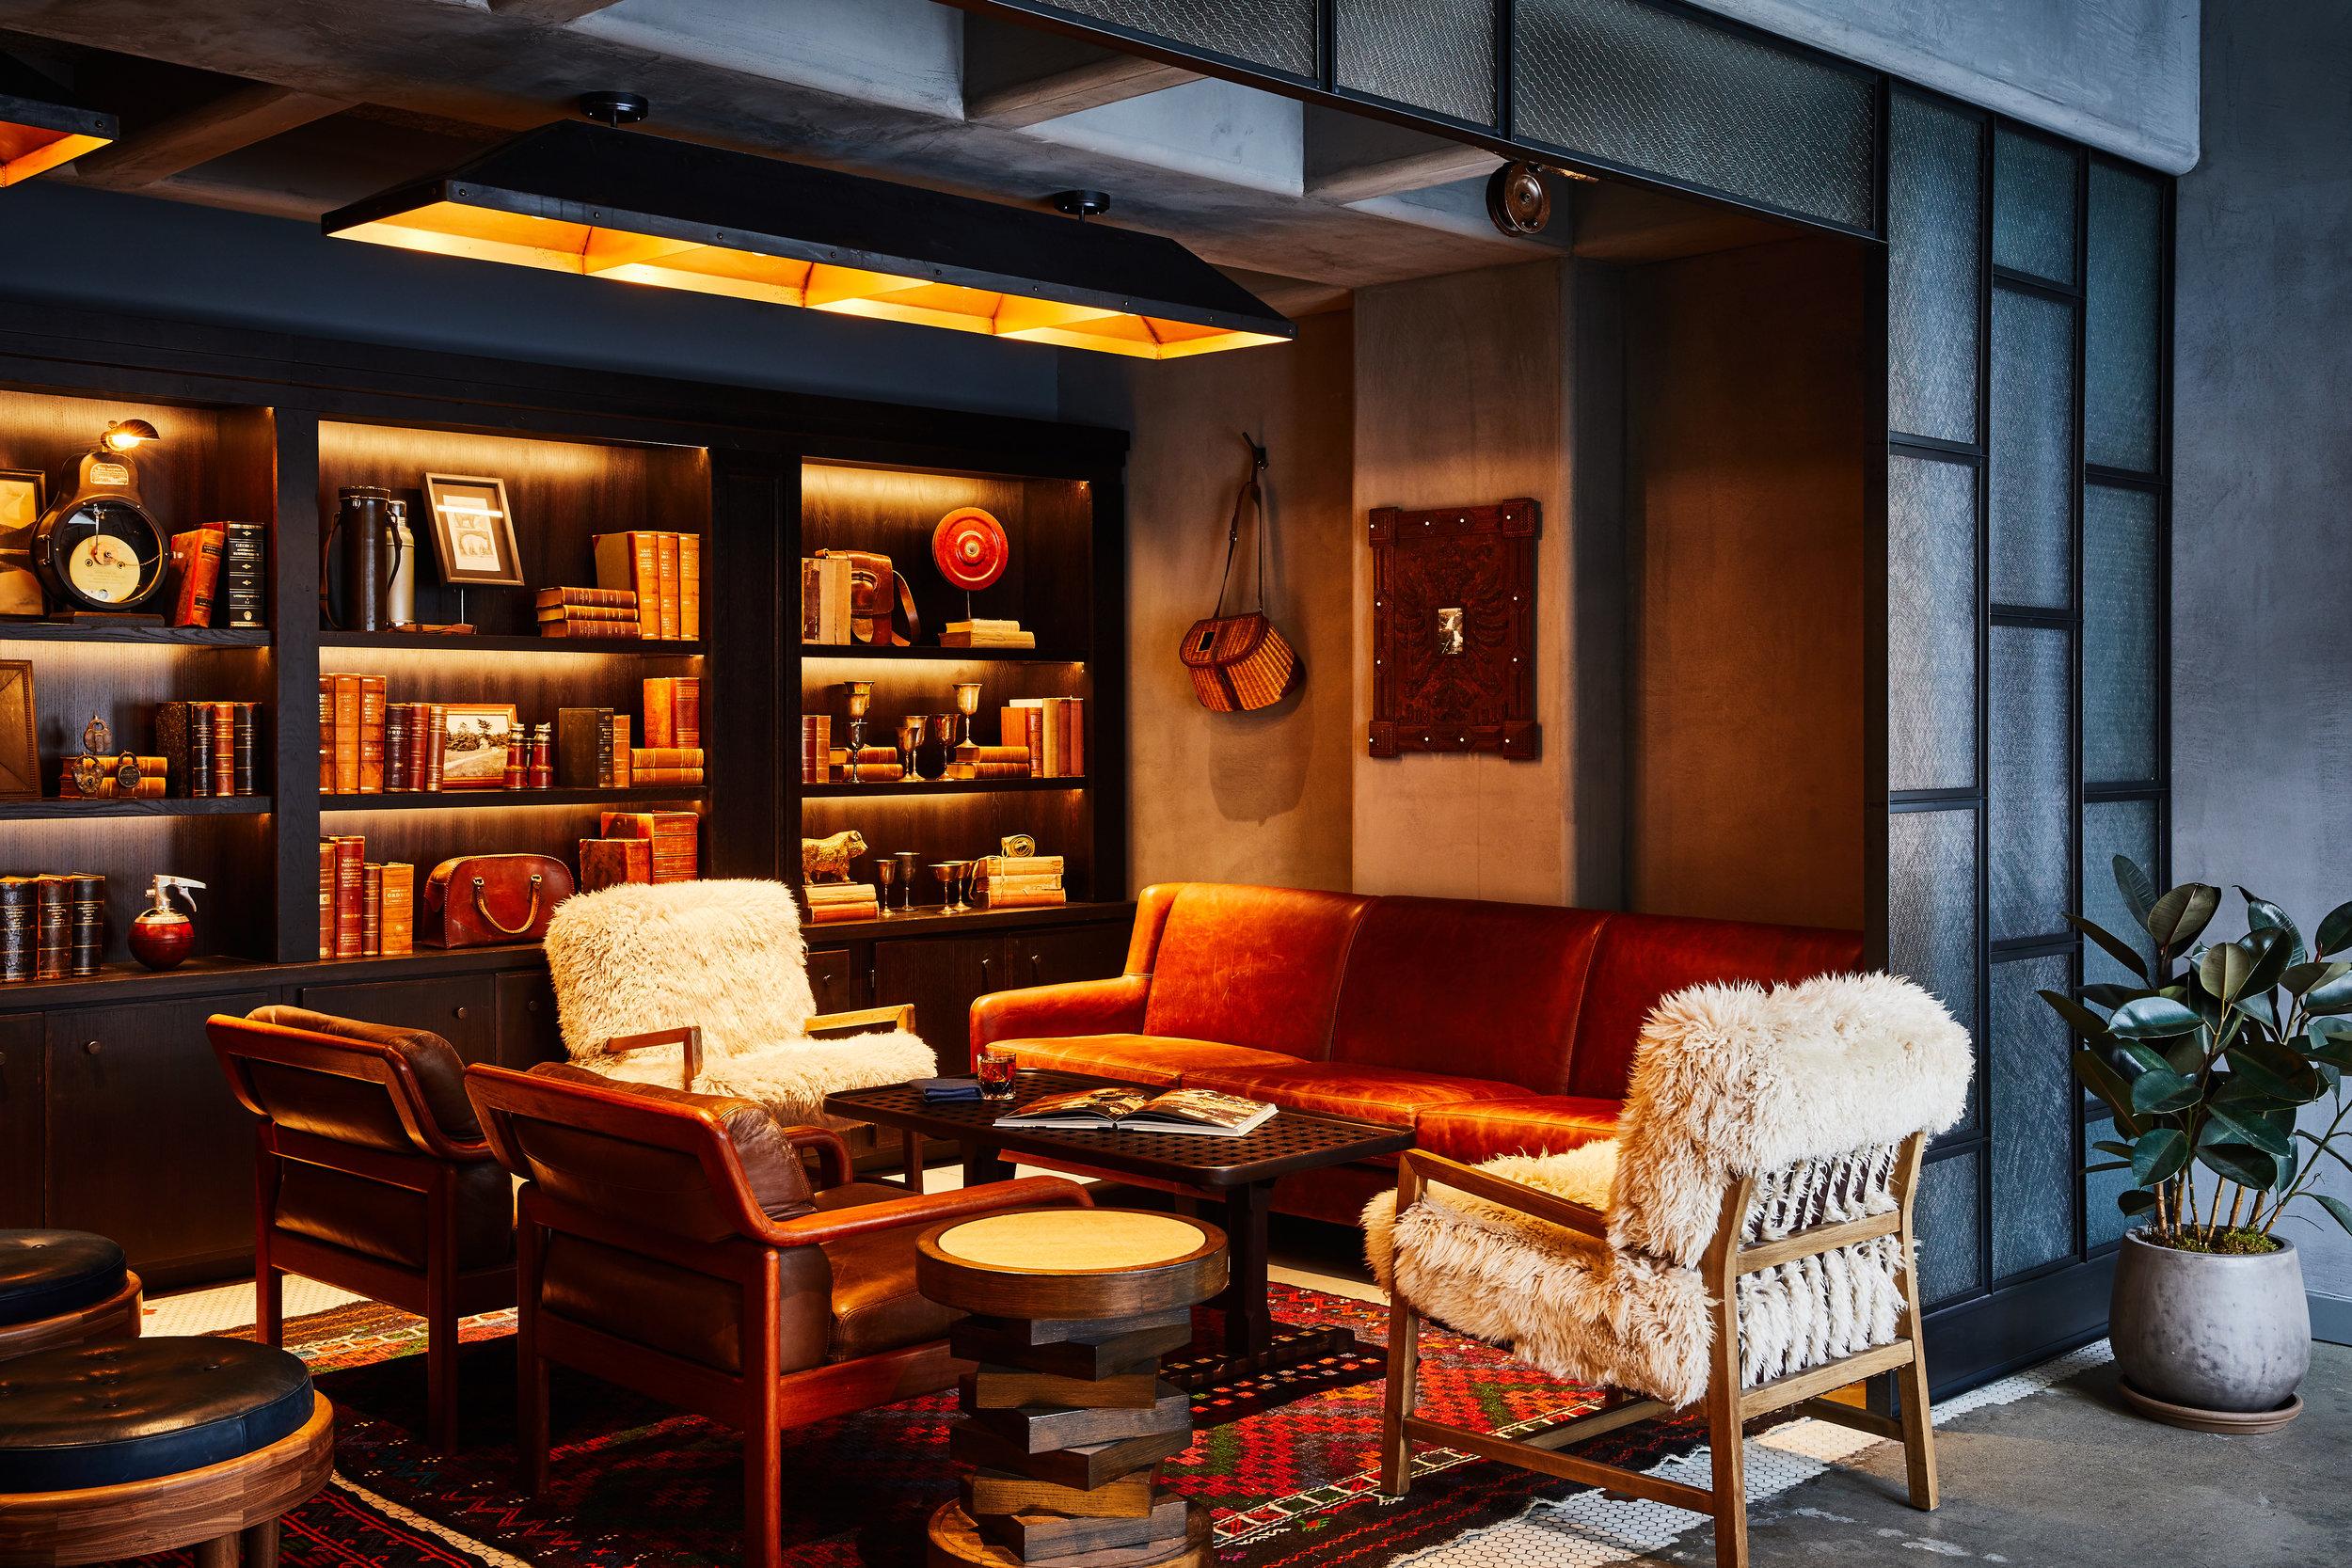 CH_S_Hanes_Woodlark_Hotel_PDX_011.jpg